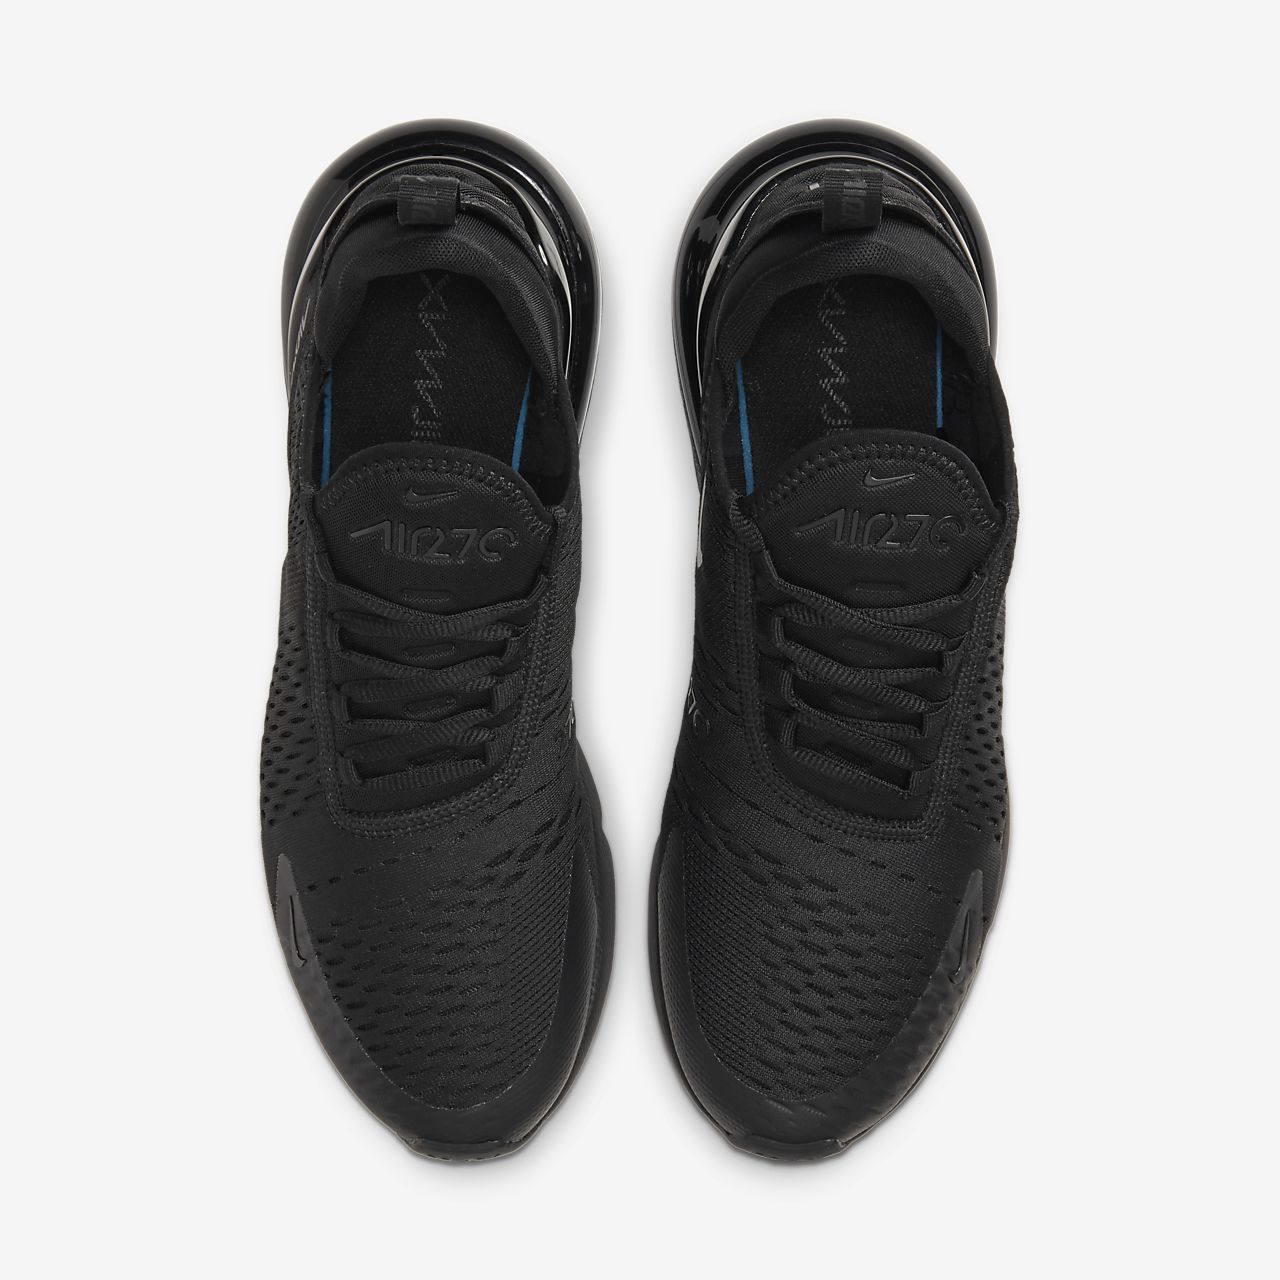 0ed9982998ef7 Chaussure Nike Air Max 270 pour Homme. Nike.com MA